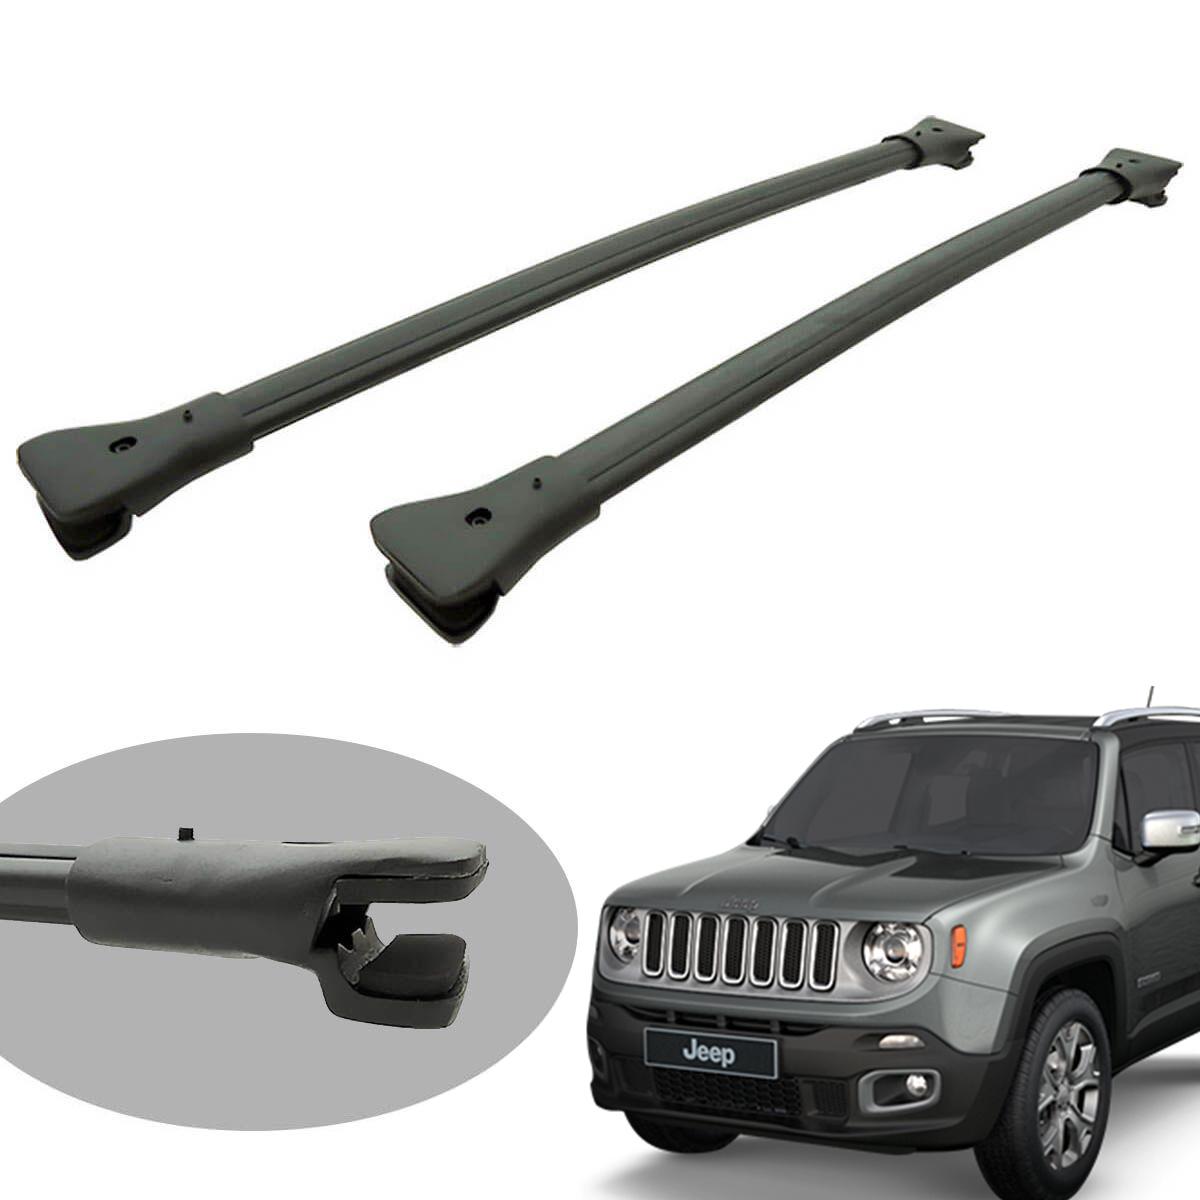 Travessa rack de teto larga preta alumínio Jeep Renegade 2016 a 2021